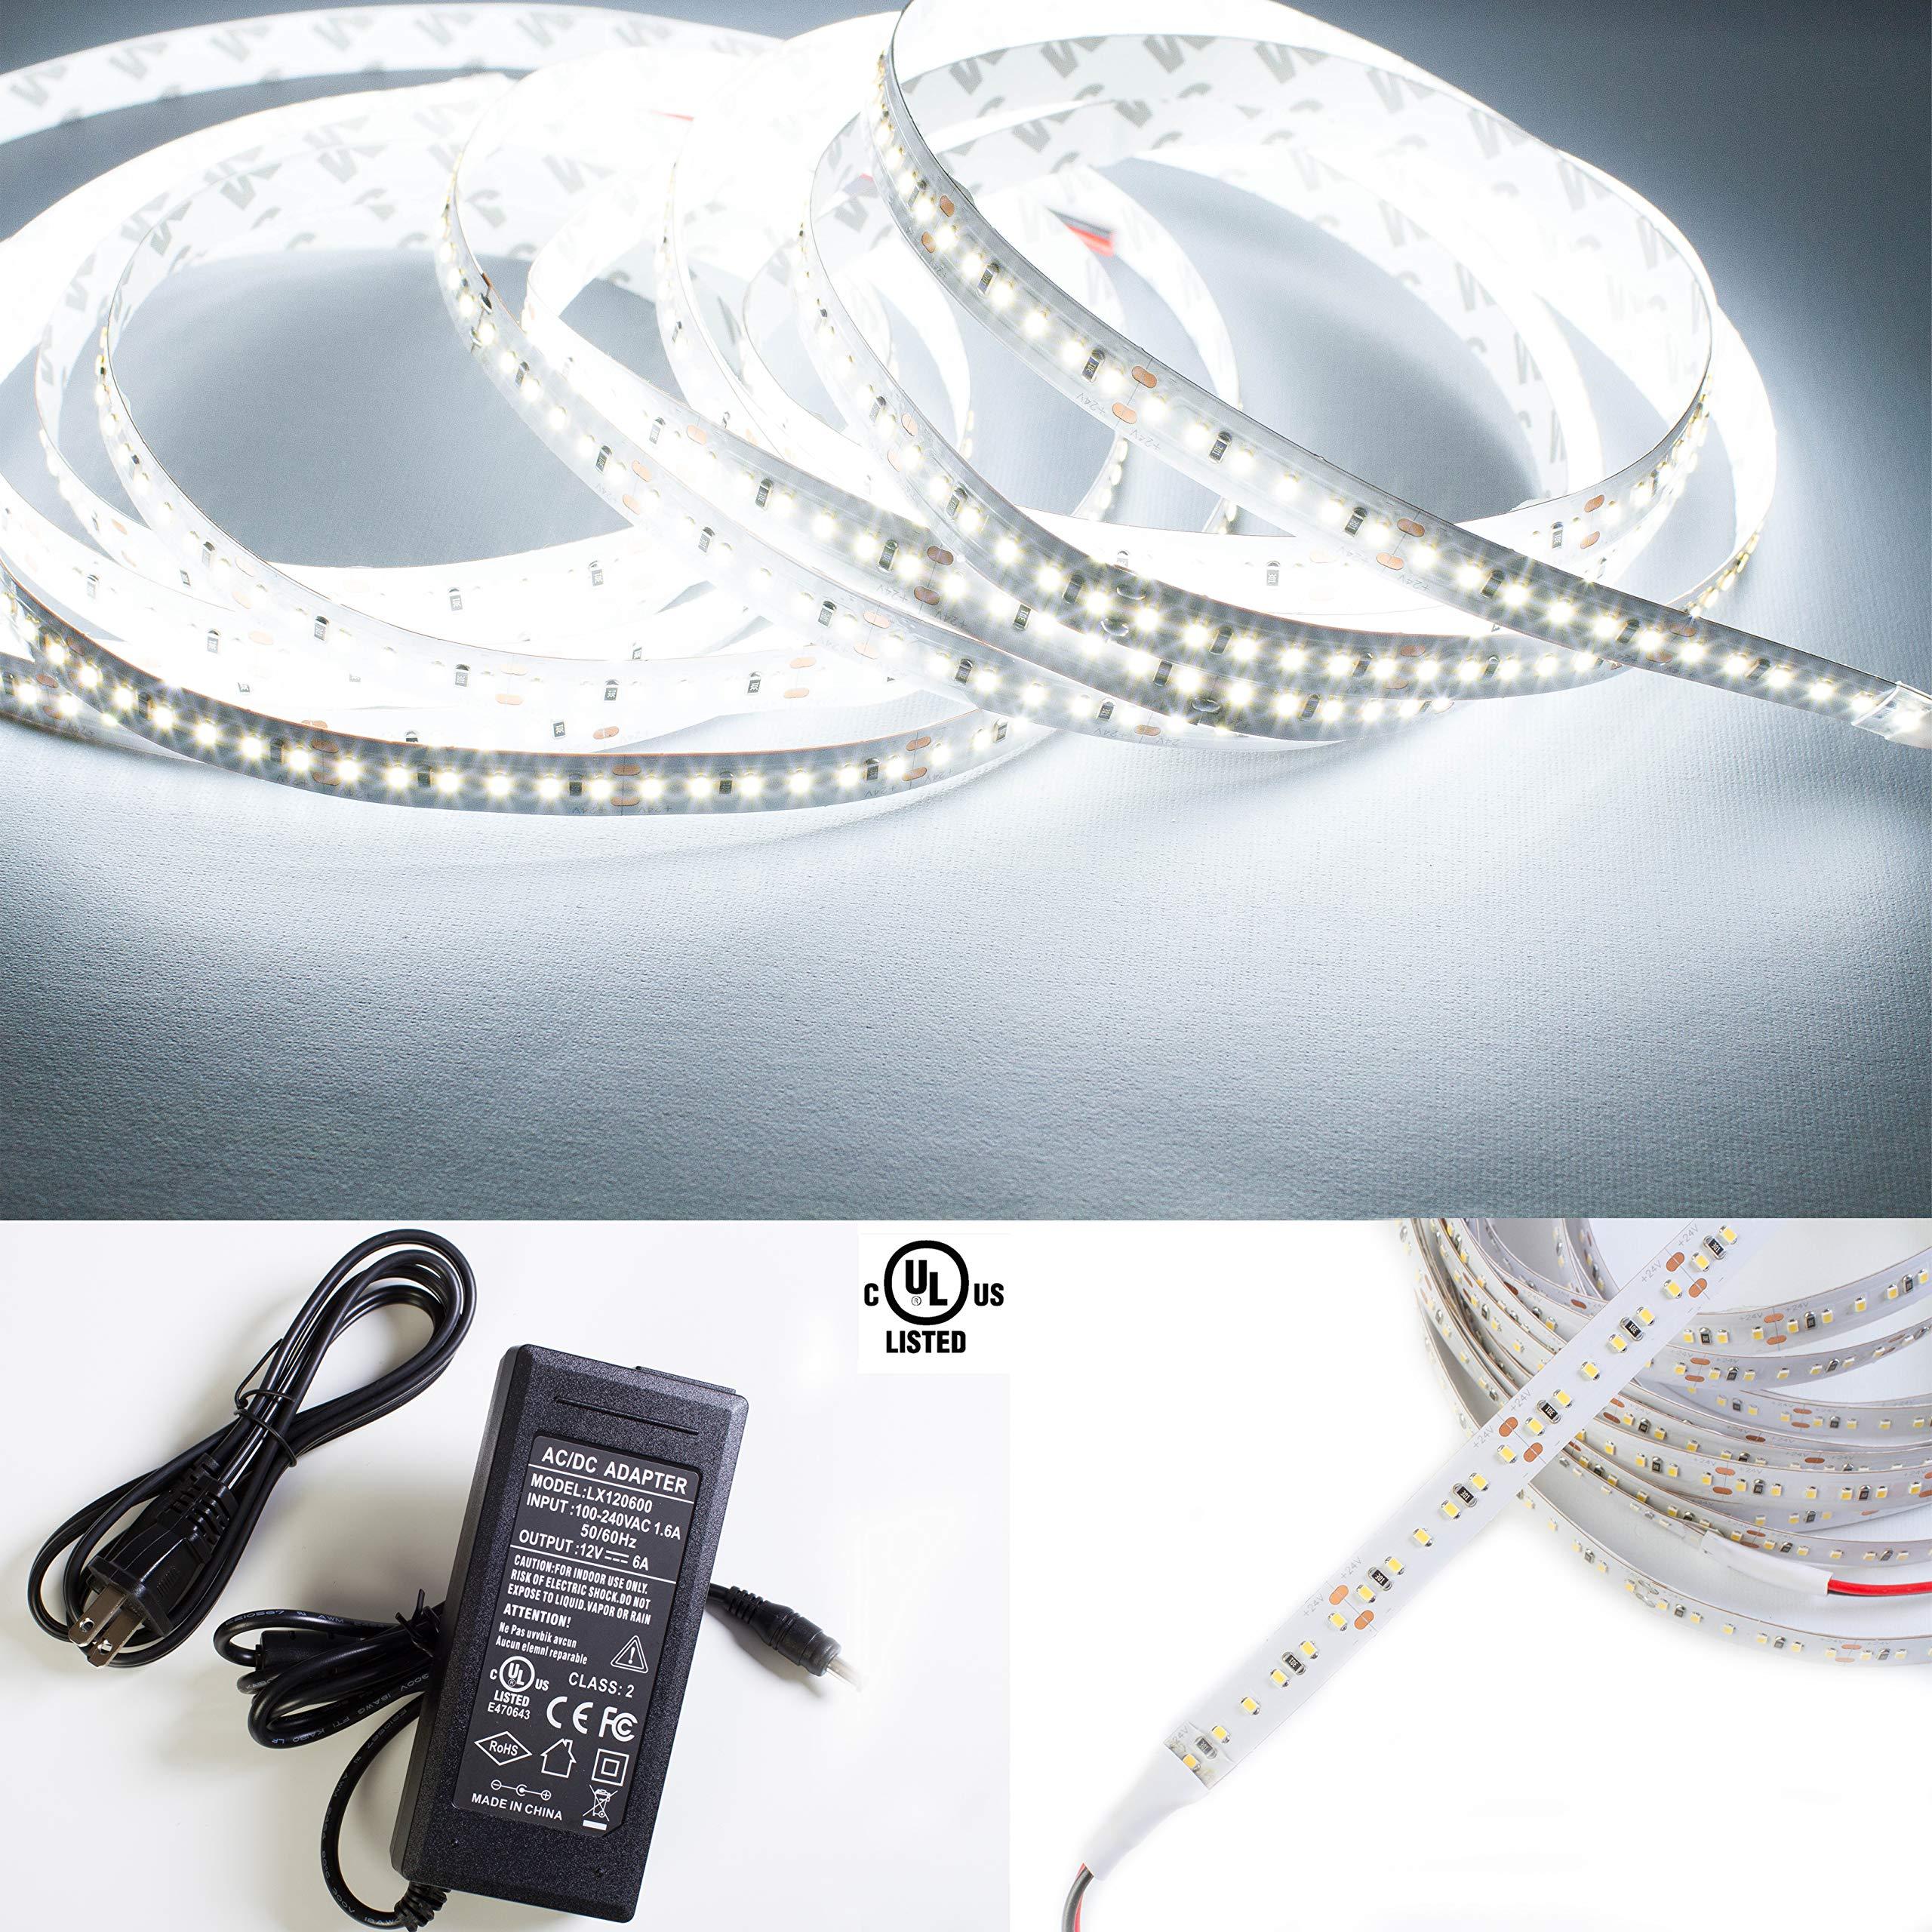 LEDUPDATES HIGH Brightness 2216 LED Strip Light CRI 90 White 6000K with UL Listed Power Supply